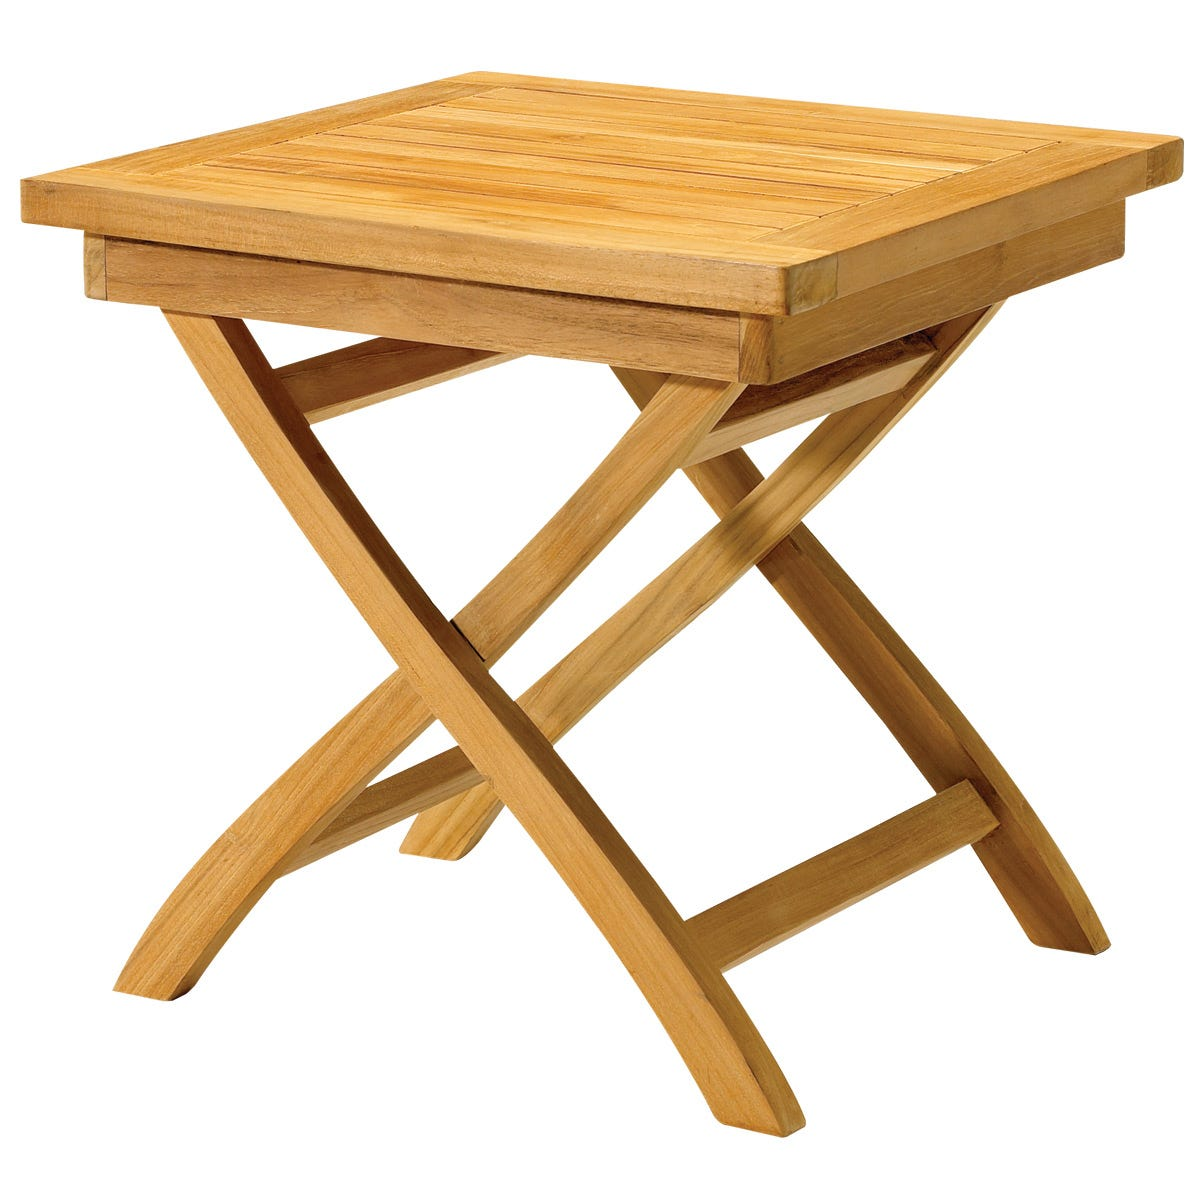 Outdoor teak folding side table from sportys preferred for Outdoor teak side table